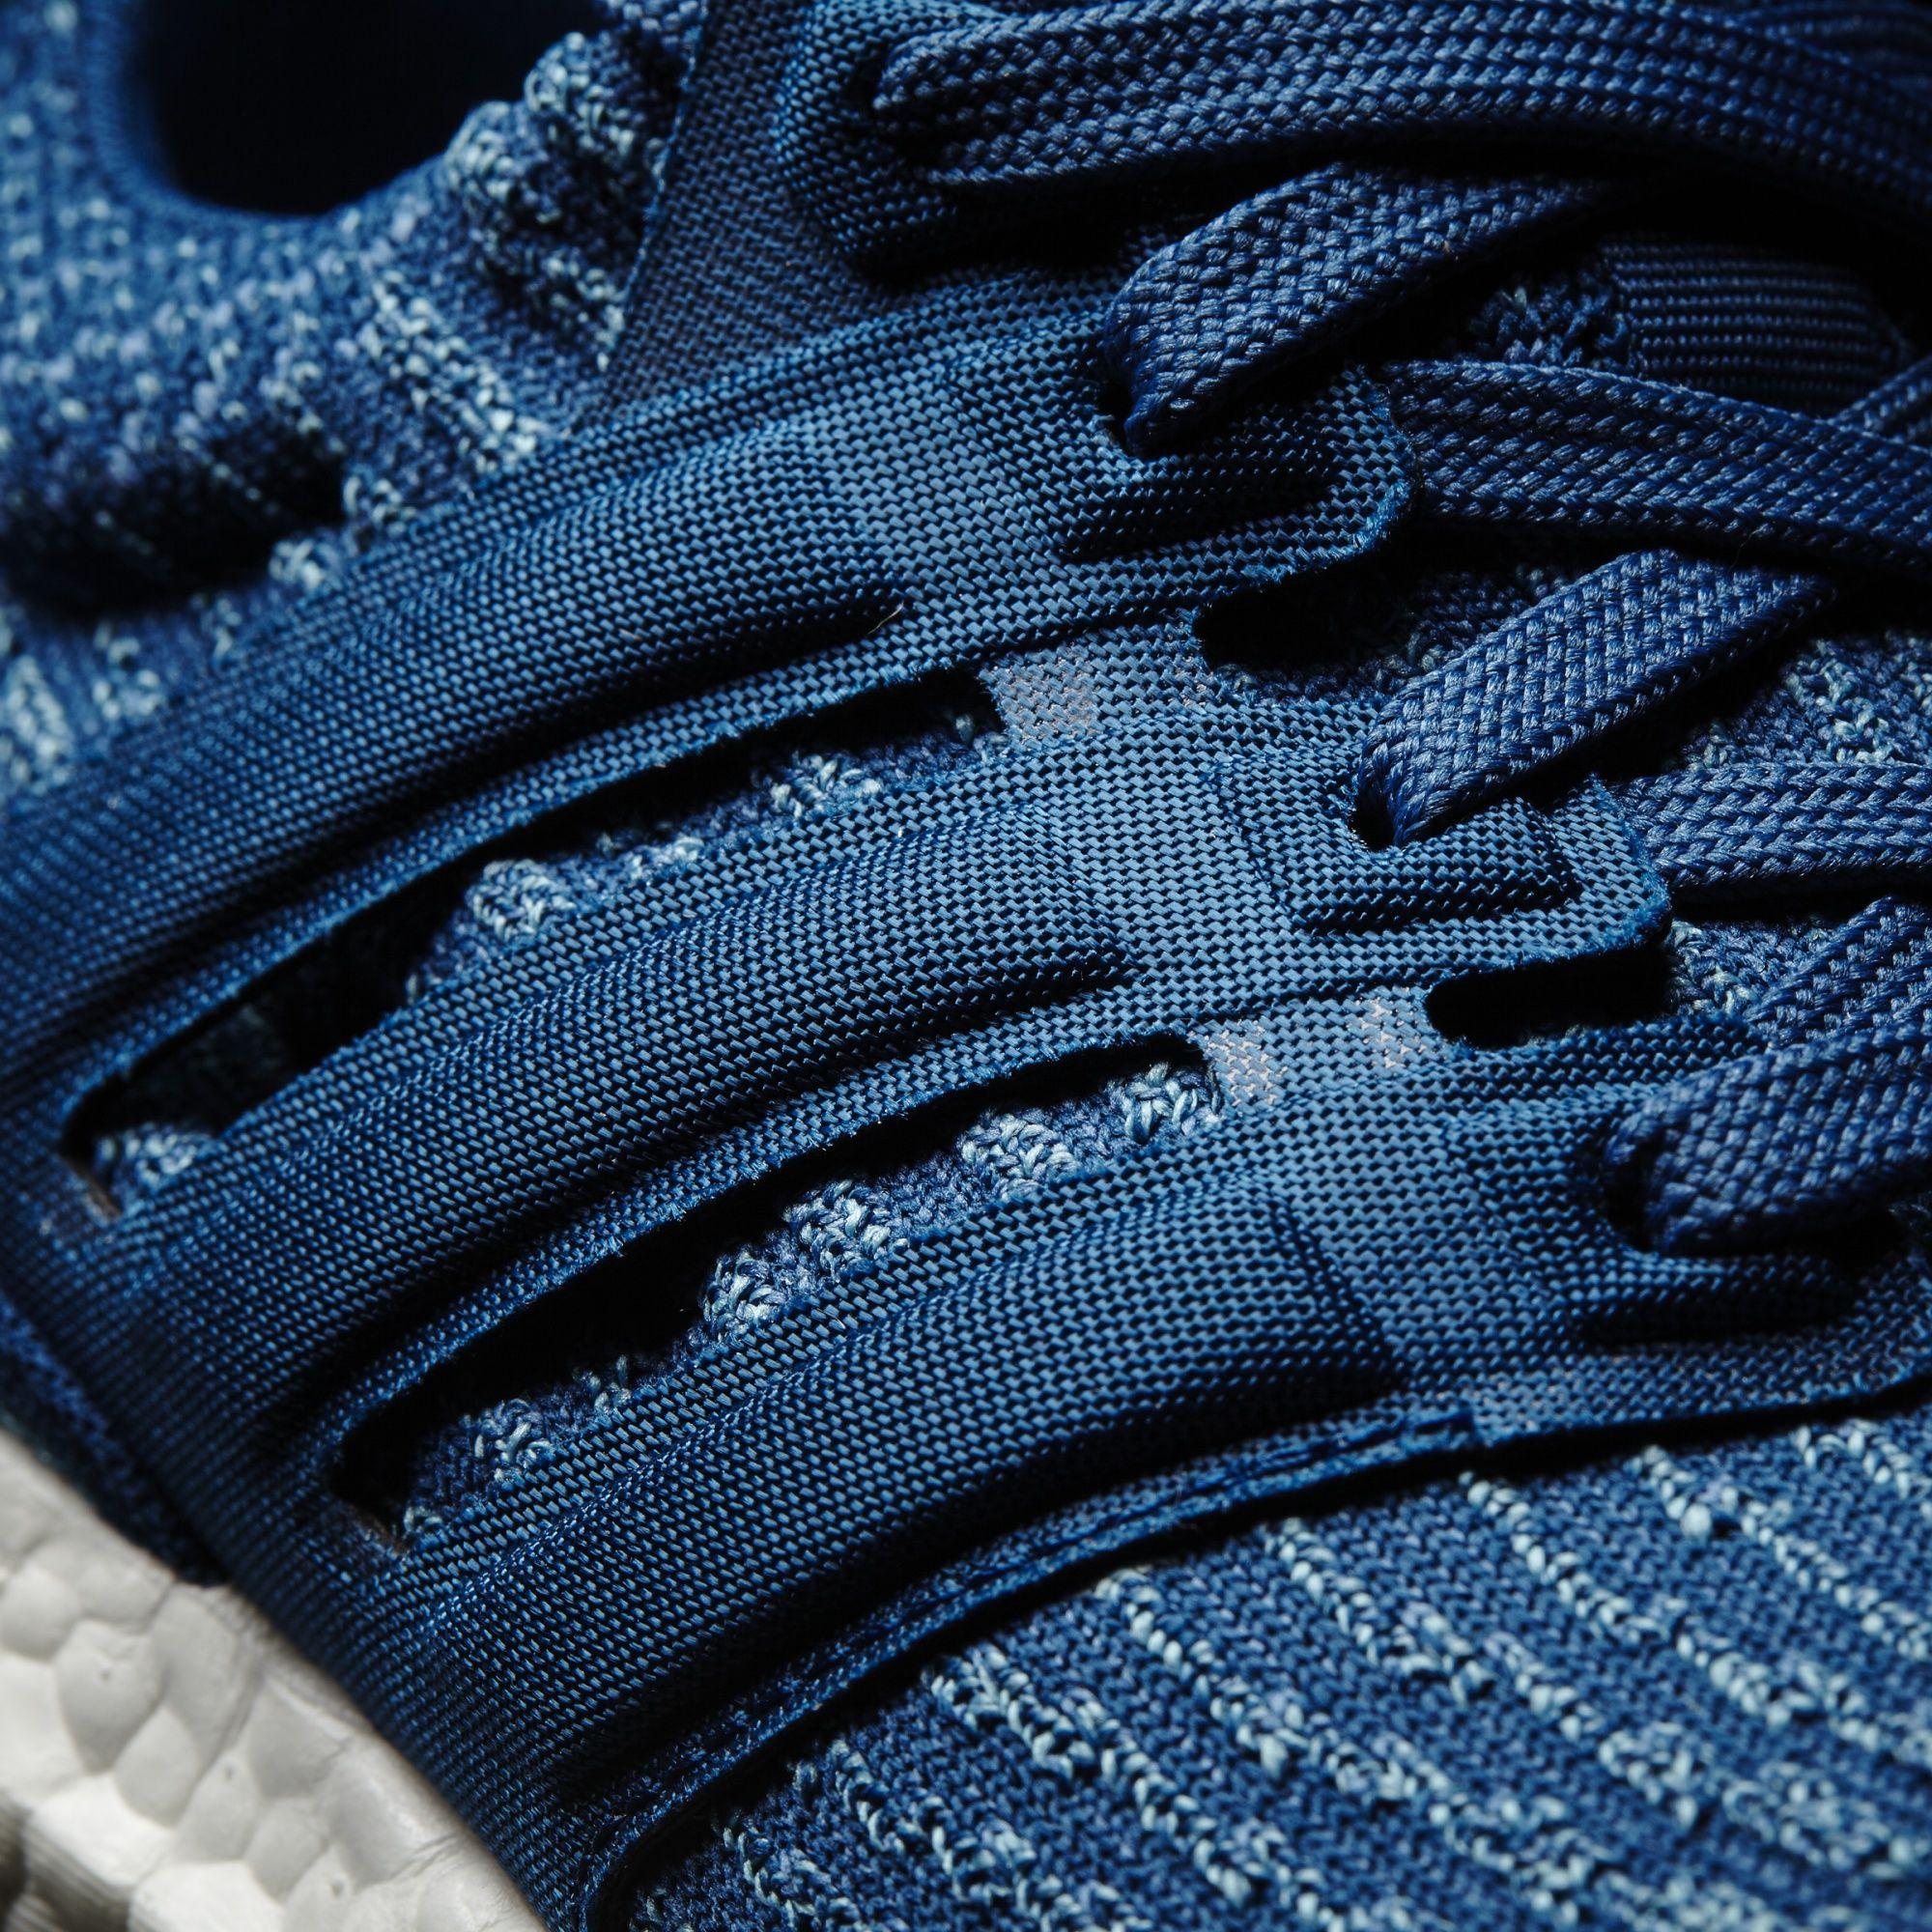 new product 4023a 67940 Parley x adidas Ultra Boost Blue Men & Women BB4762 BB1978 ...